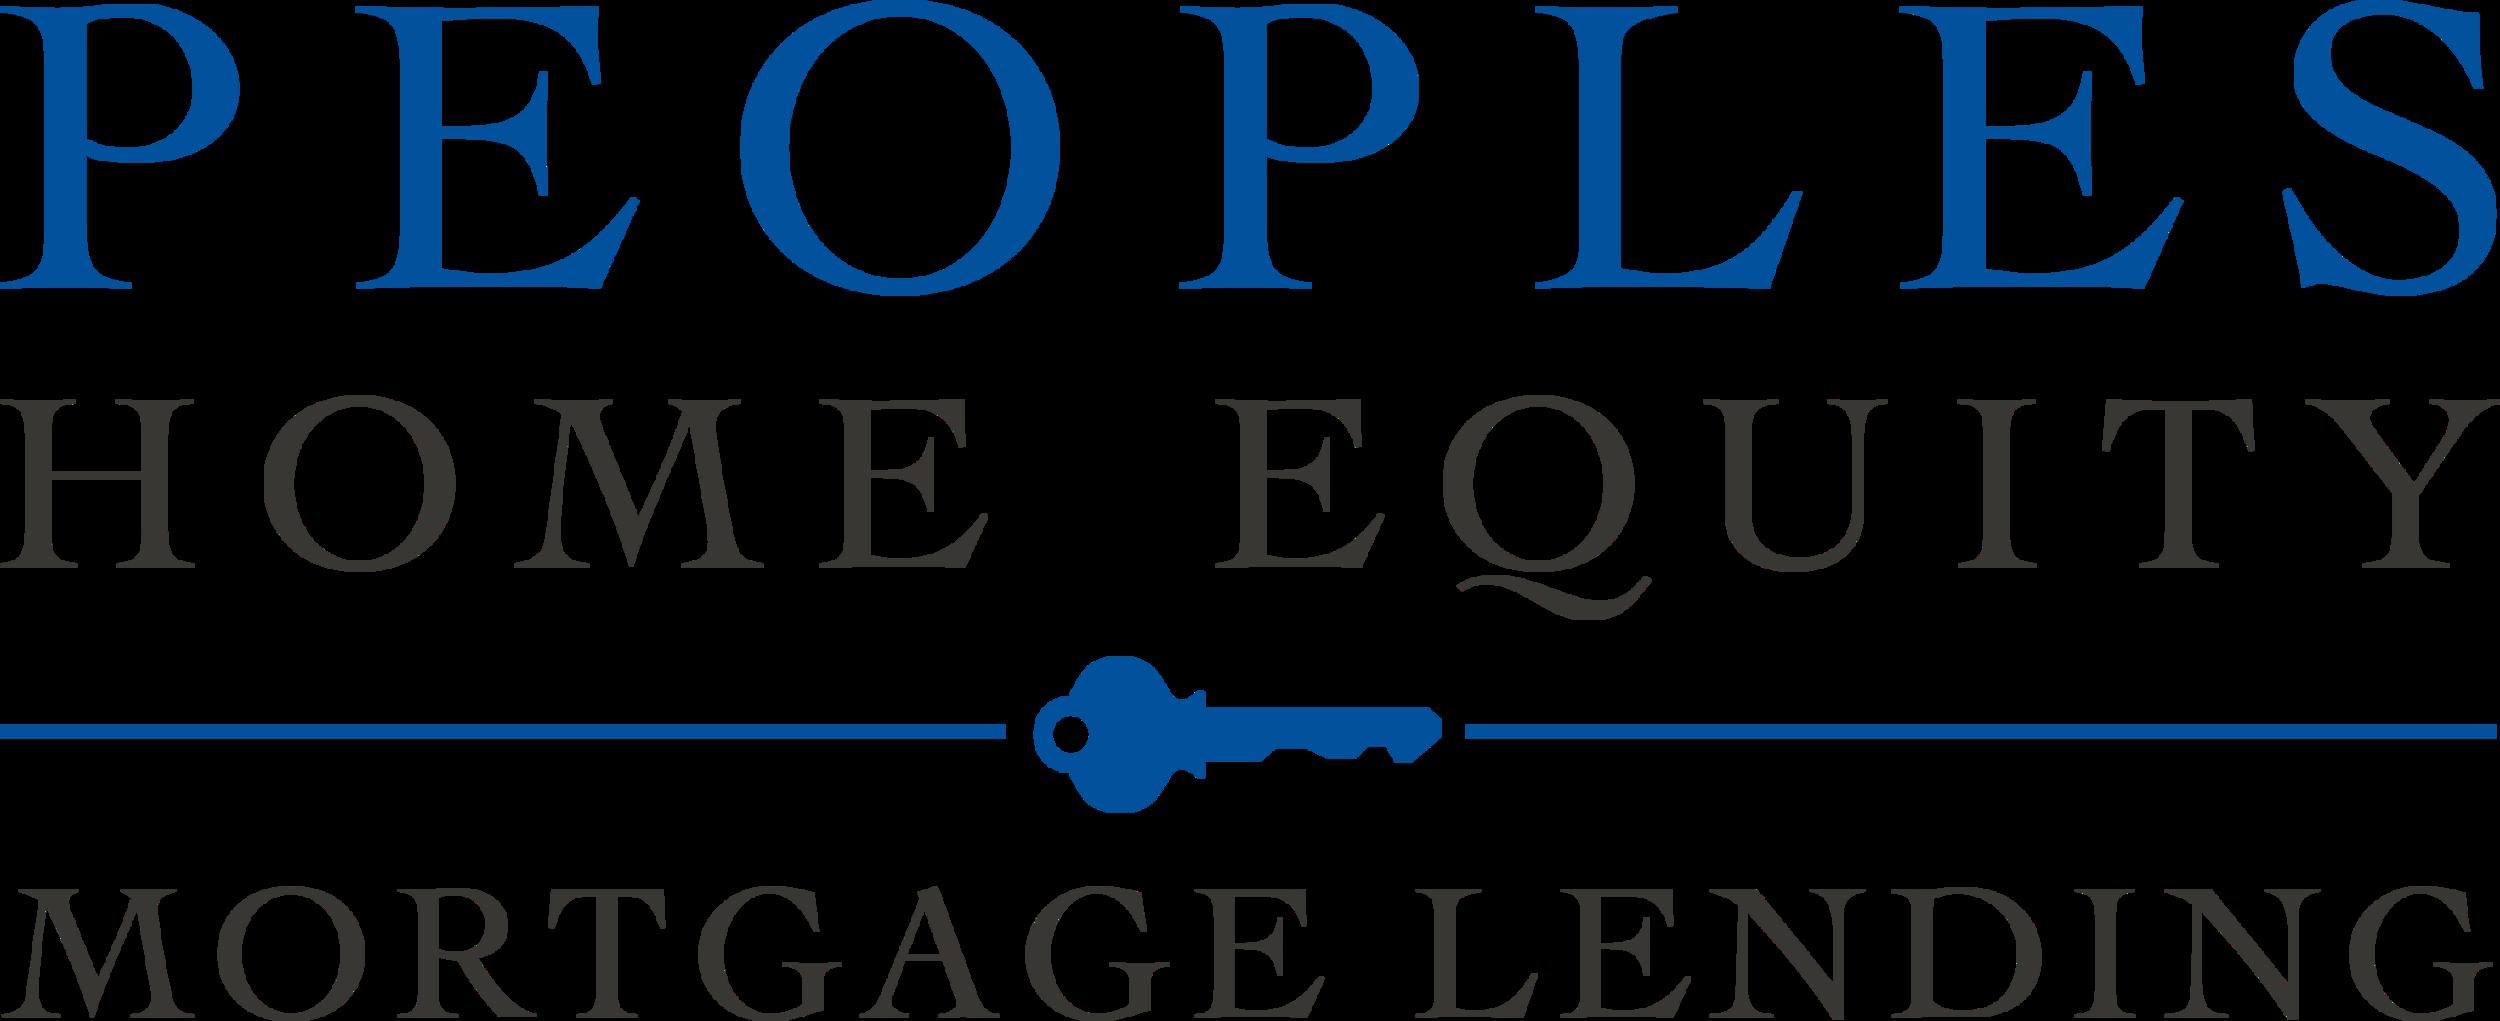 peoples_home_equity_inc.jpg.png